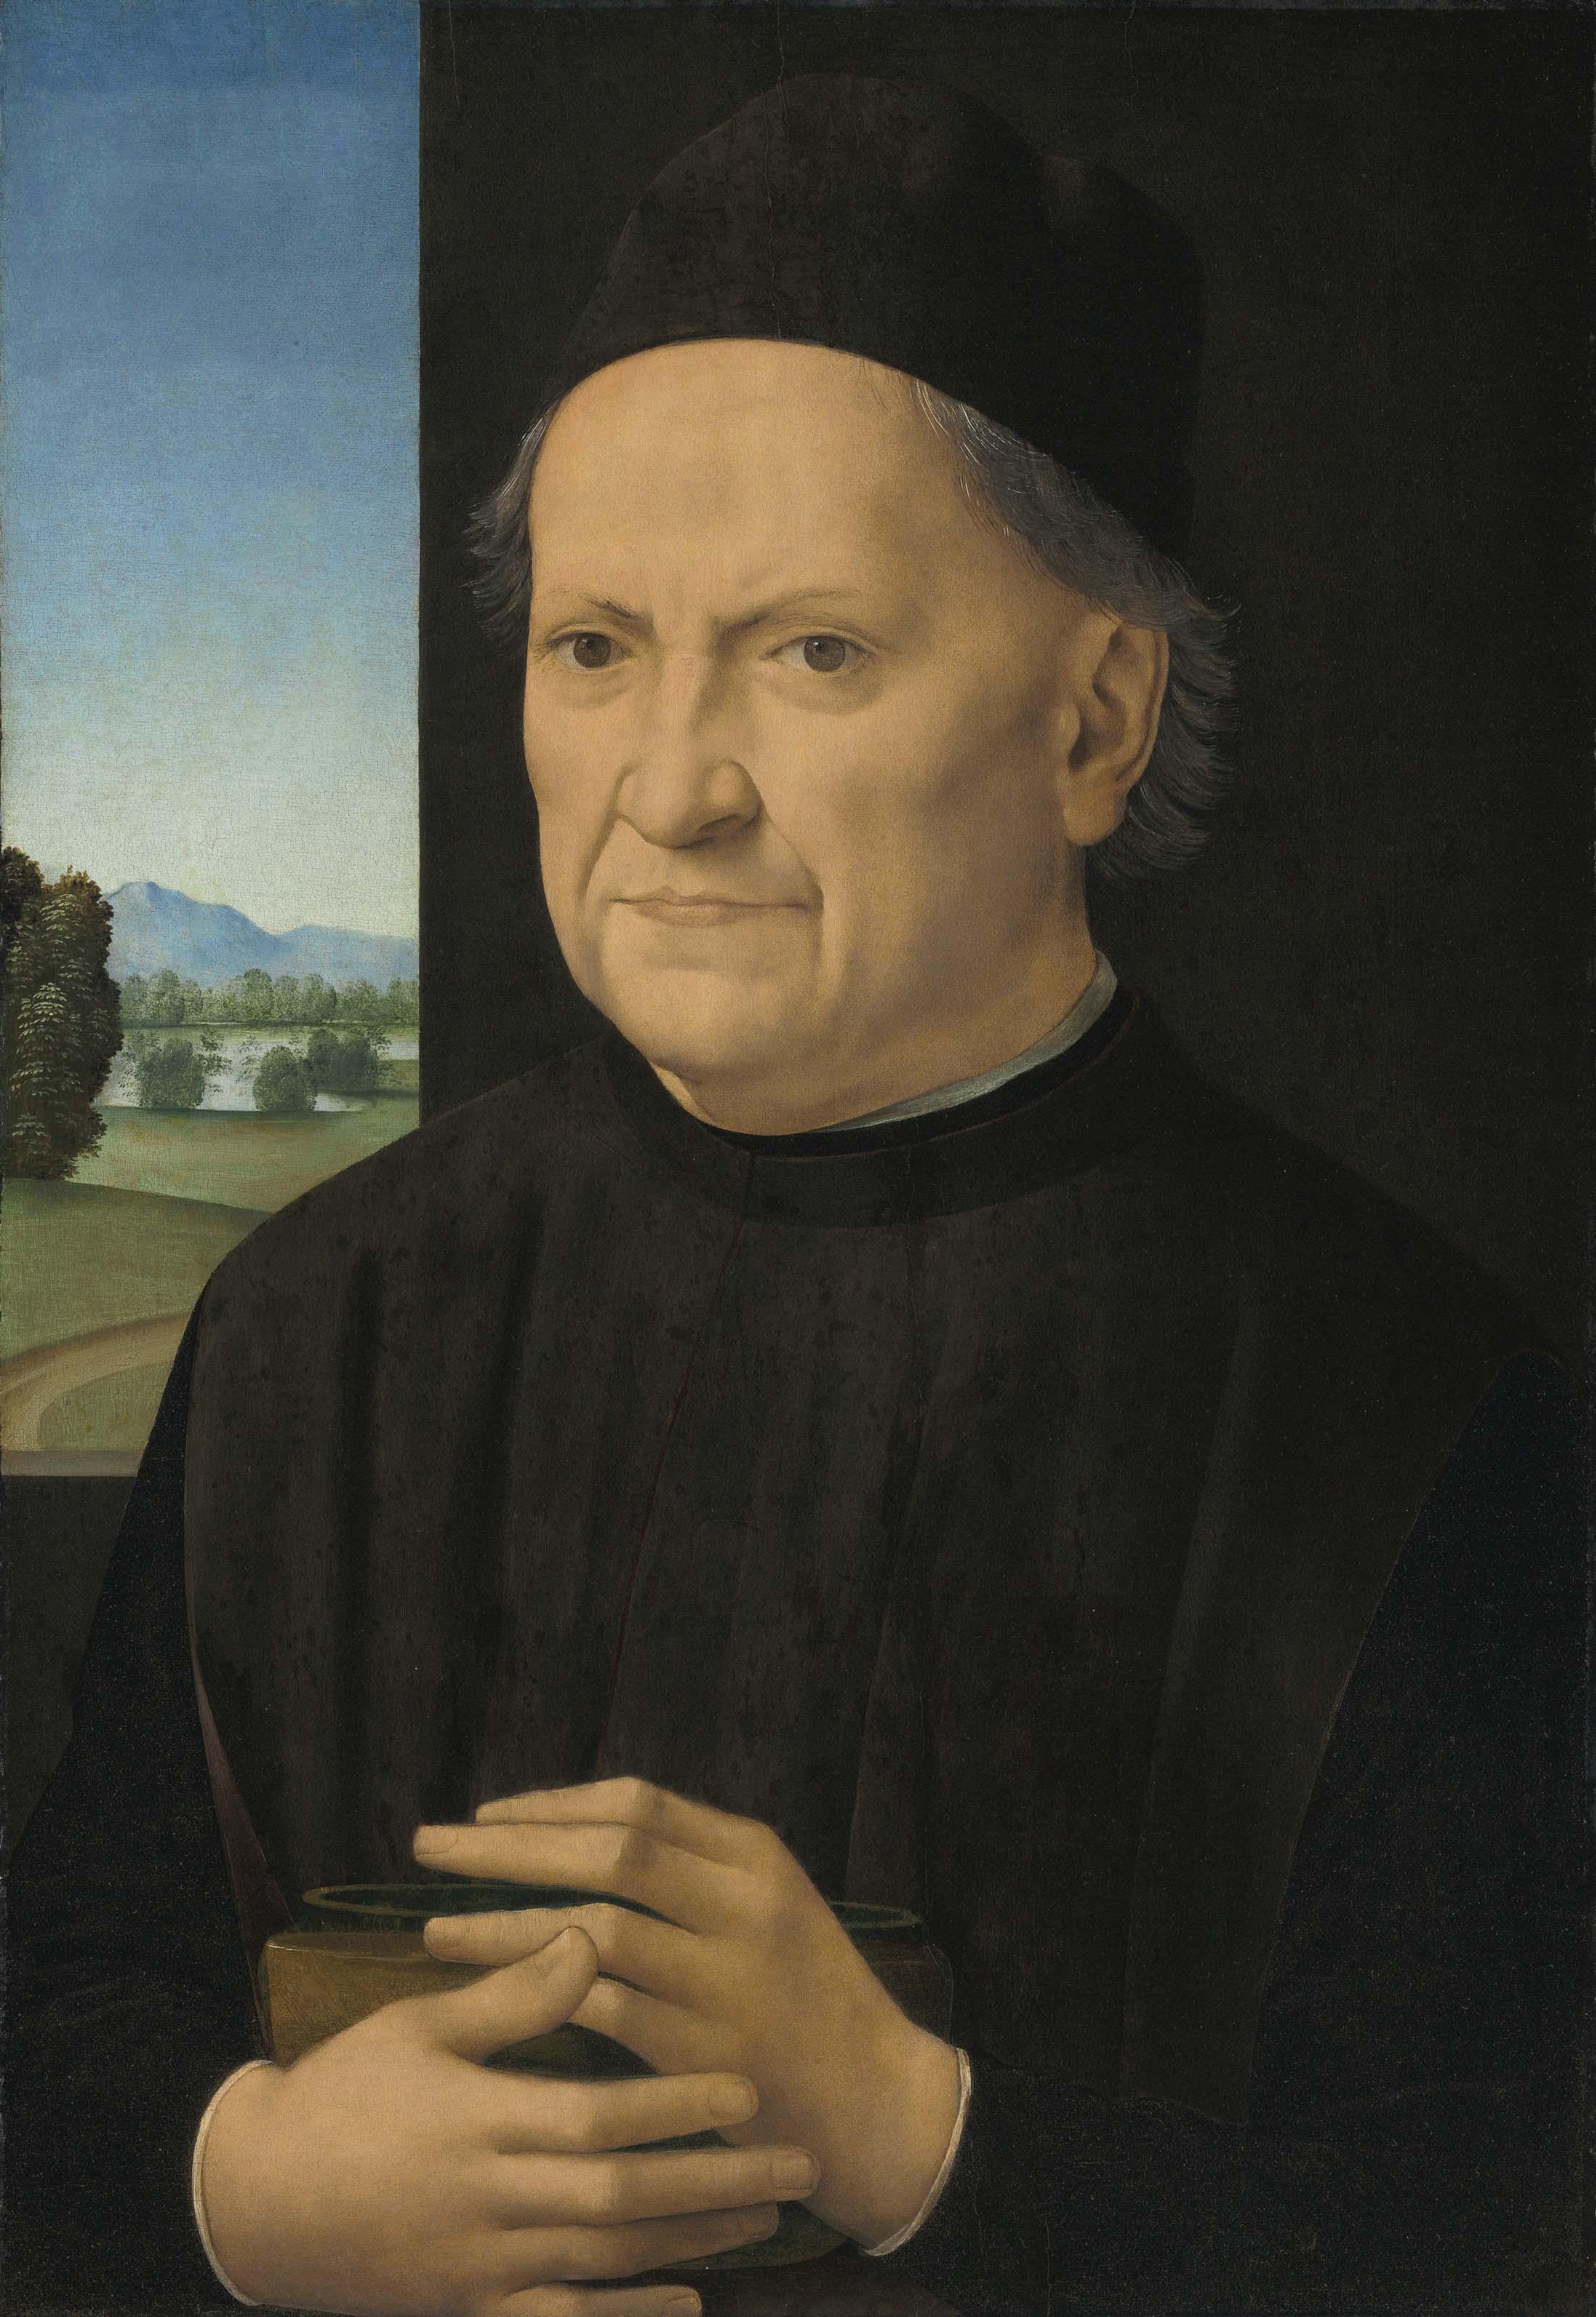 Portrait of a gentleman, possibly Girolamo Benivieni (1453-1542), half-length